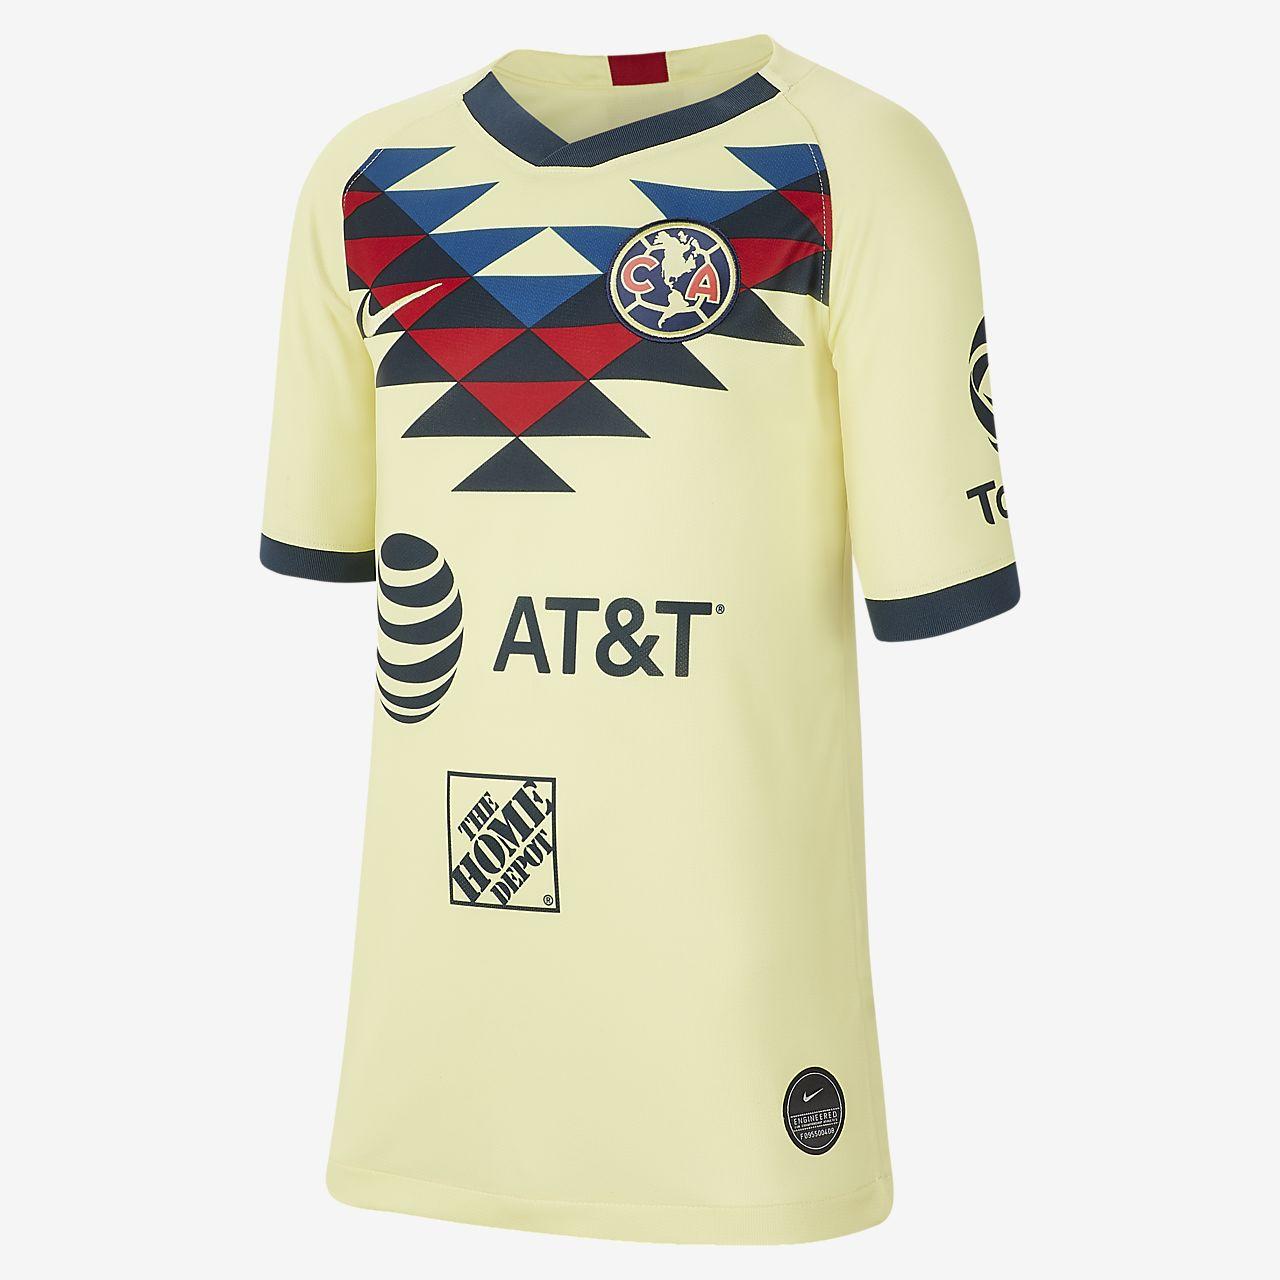 Nike Boys Tiempo II Soccer Jersey T-Shirt Navy Size Youth